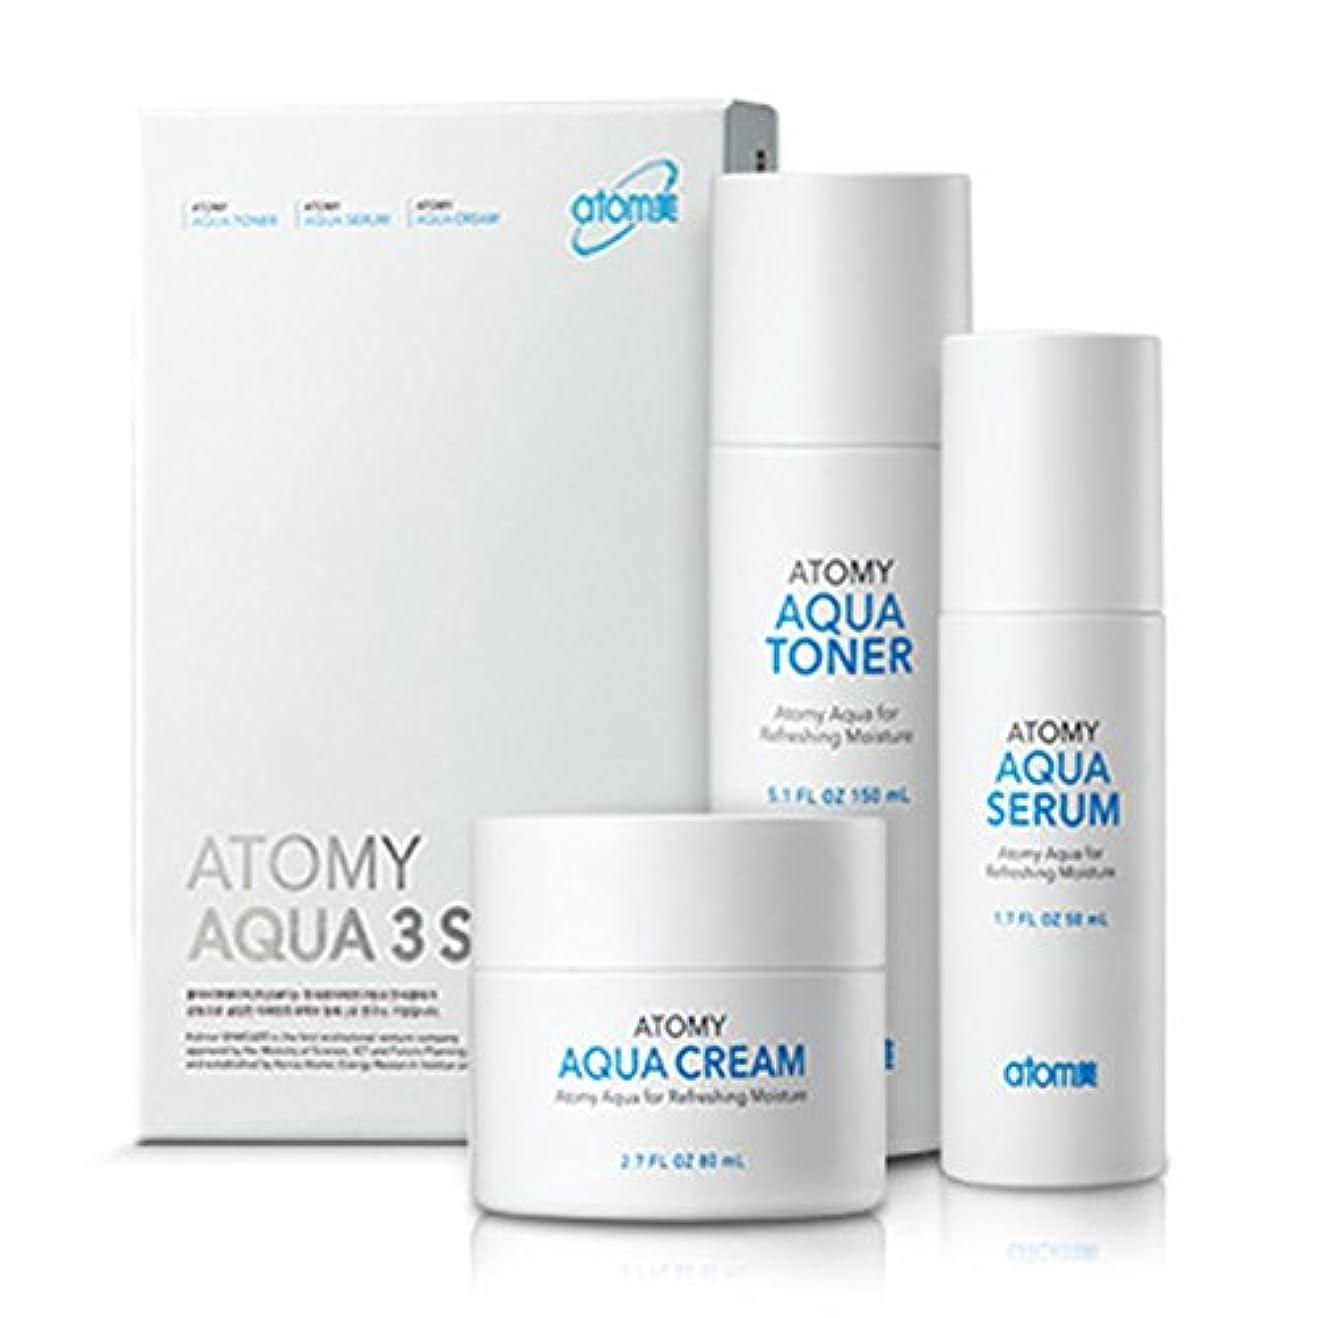 [Atom美 アトミ/ Atomy] AQUA 3-piece set Waterfull Toner, Serum, Cream/アクア水分3点セット+[Sample Gift](海外直送品)